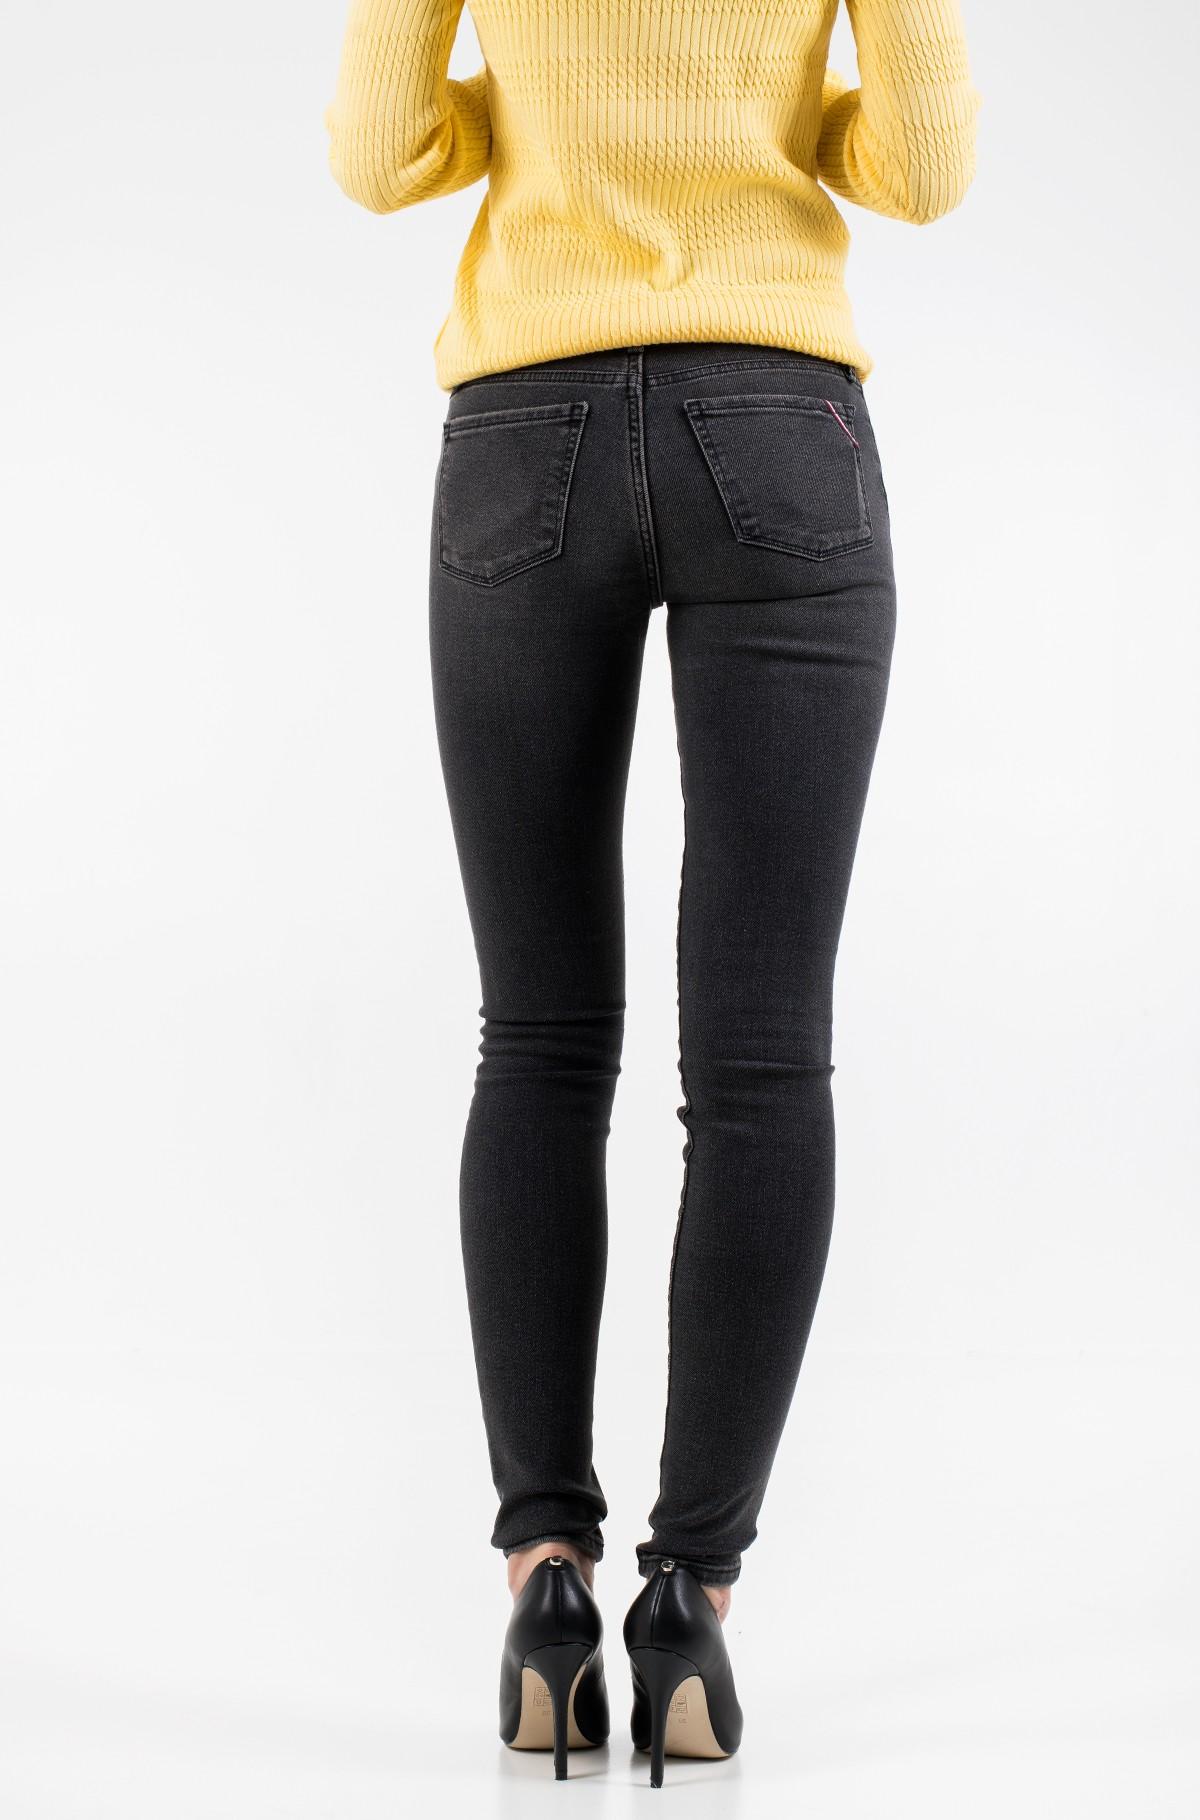 Jeans TH COOL COMO SKINNY RW ROSE-full-2